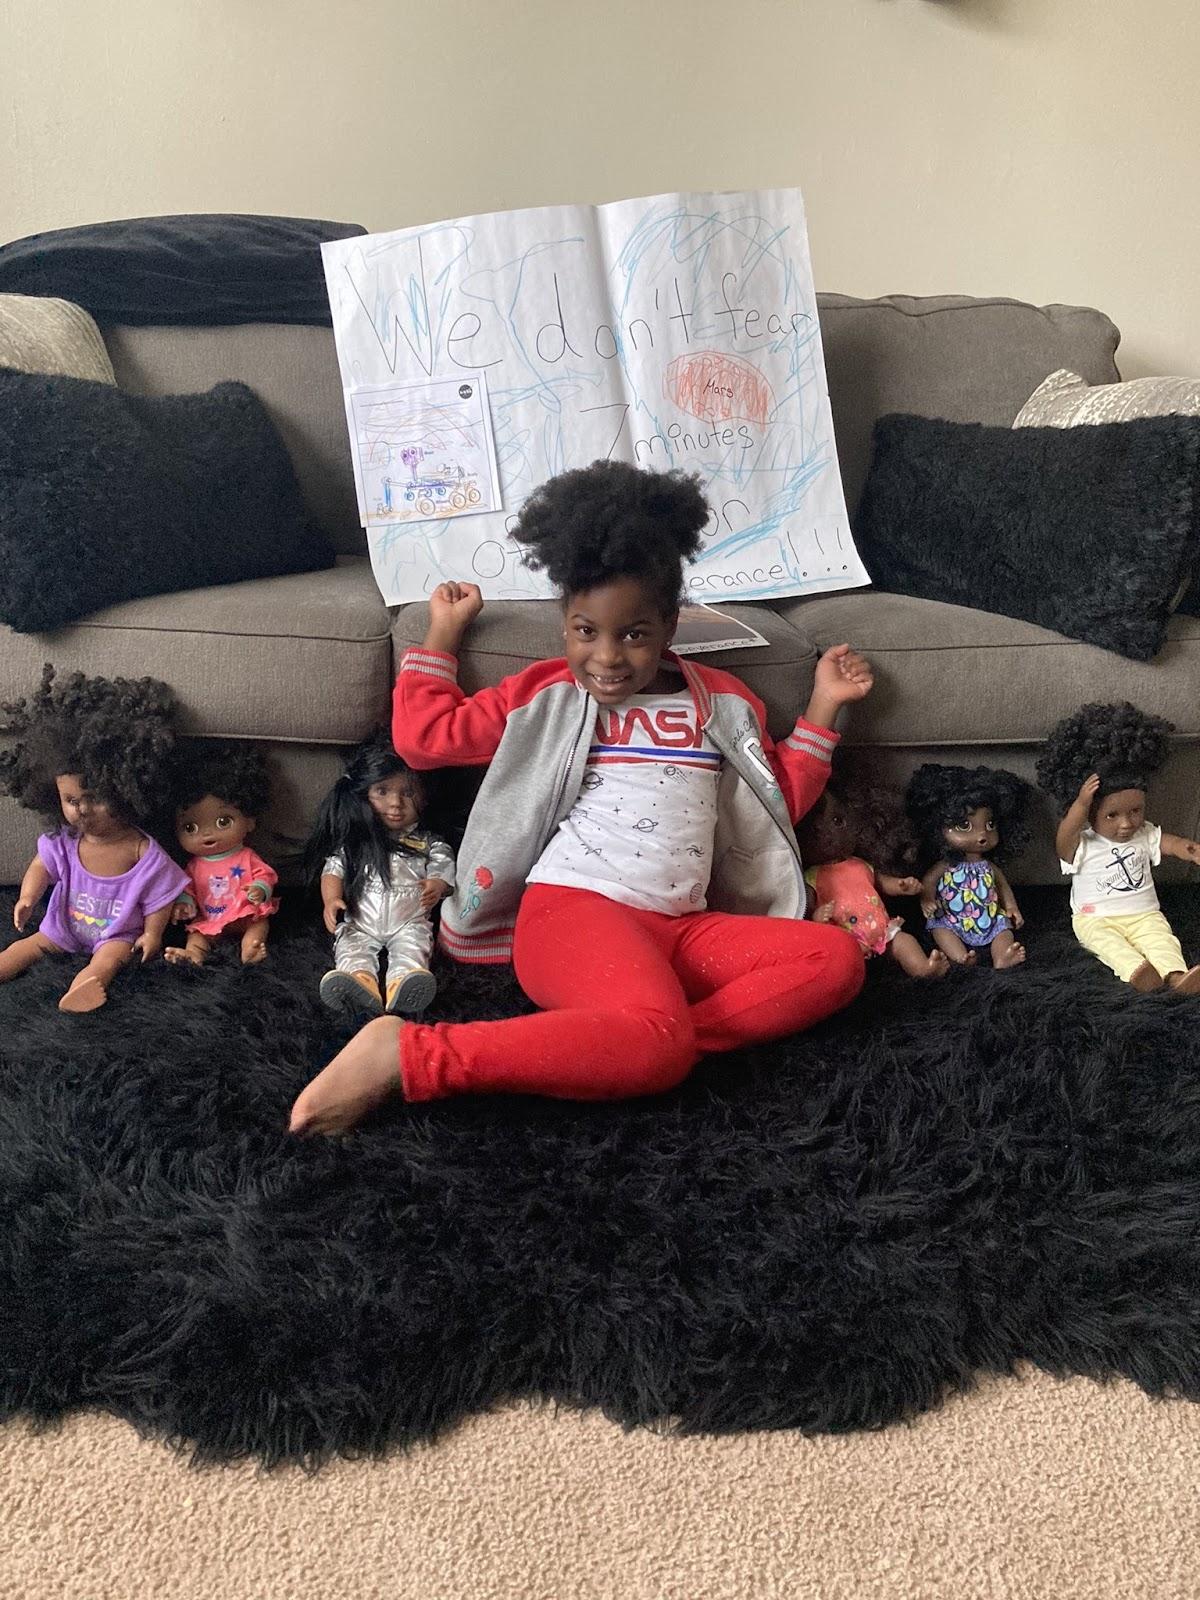 Ryan with Black girl dolls.